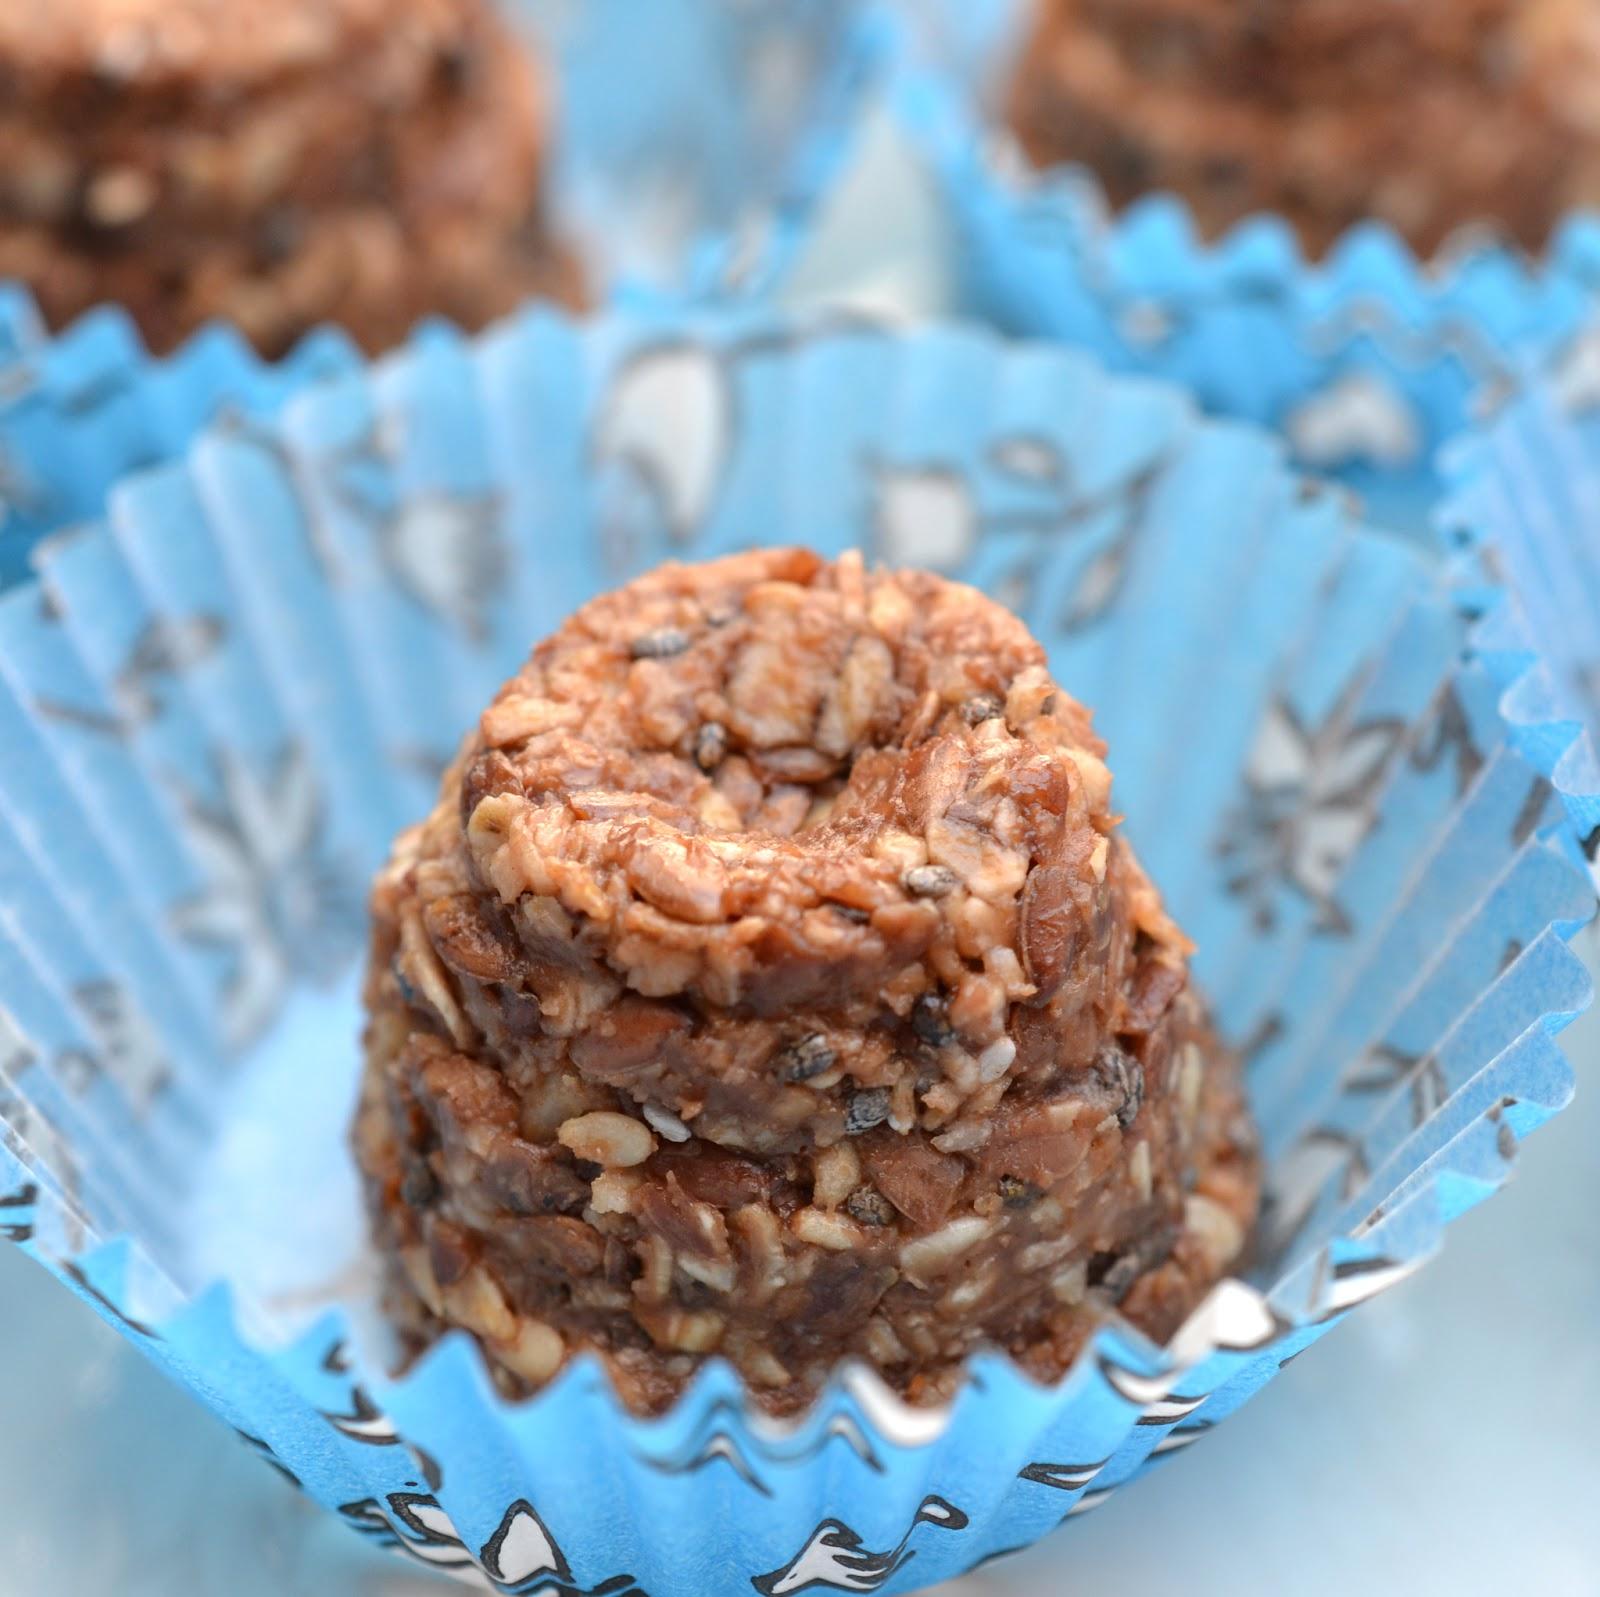 http://lenas-sofa.blogspot.de/2015/04/no-bake-peanut-butter-energy-pralinchen.html